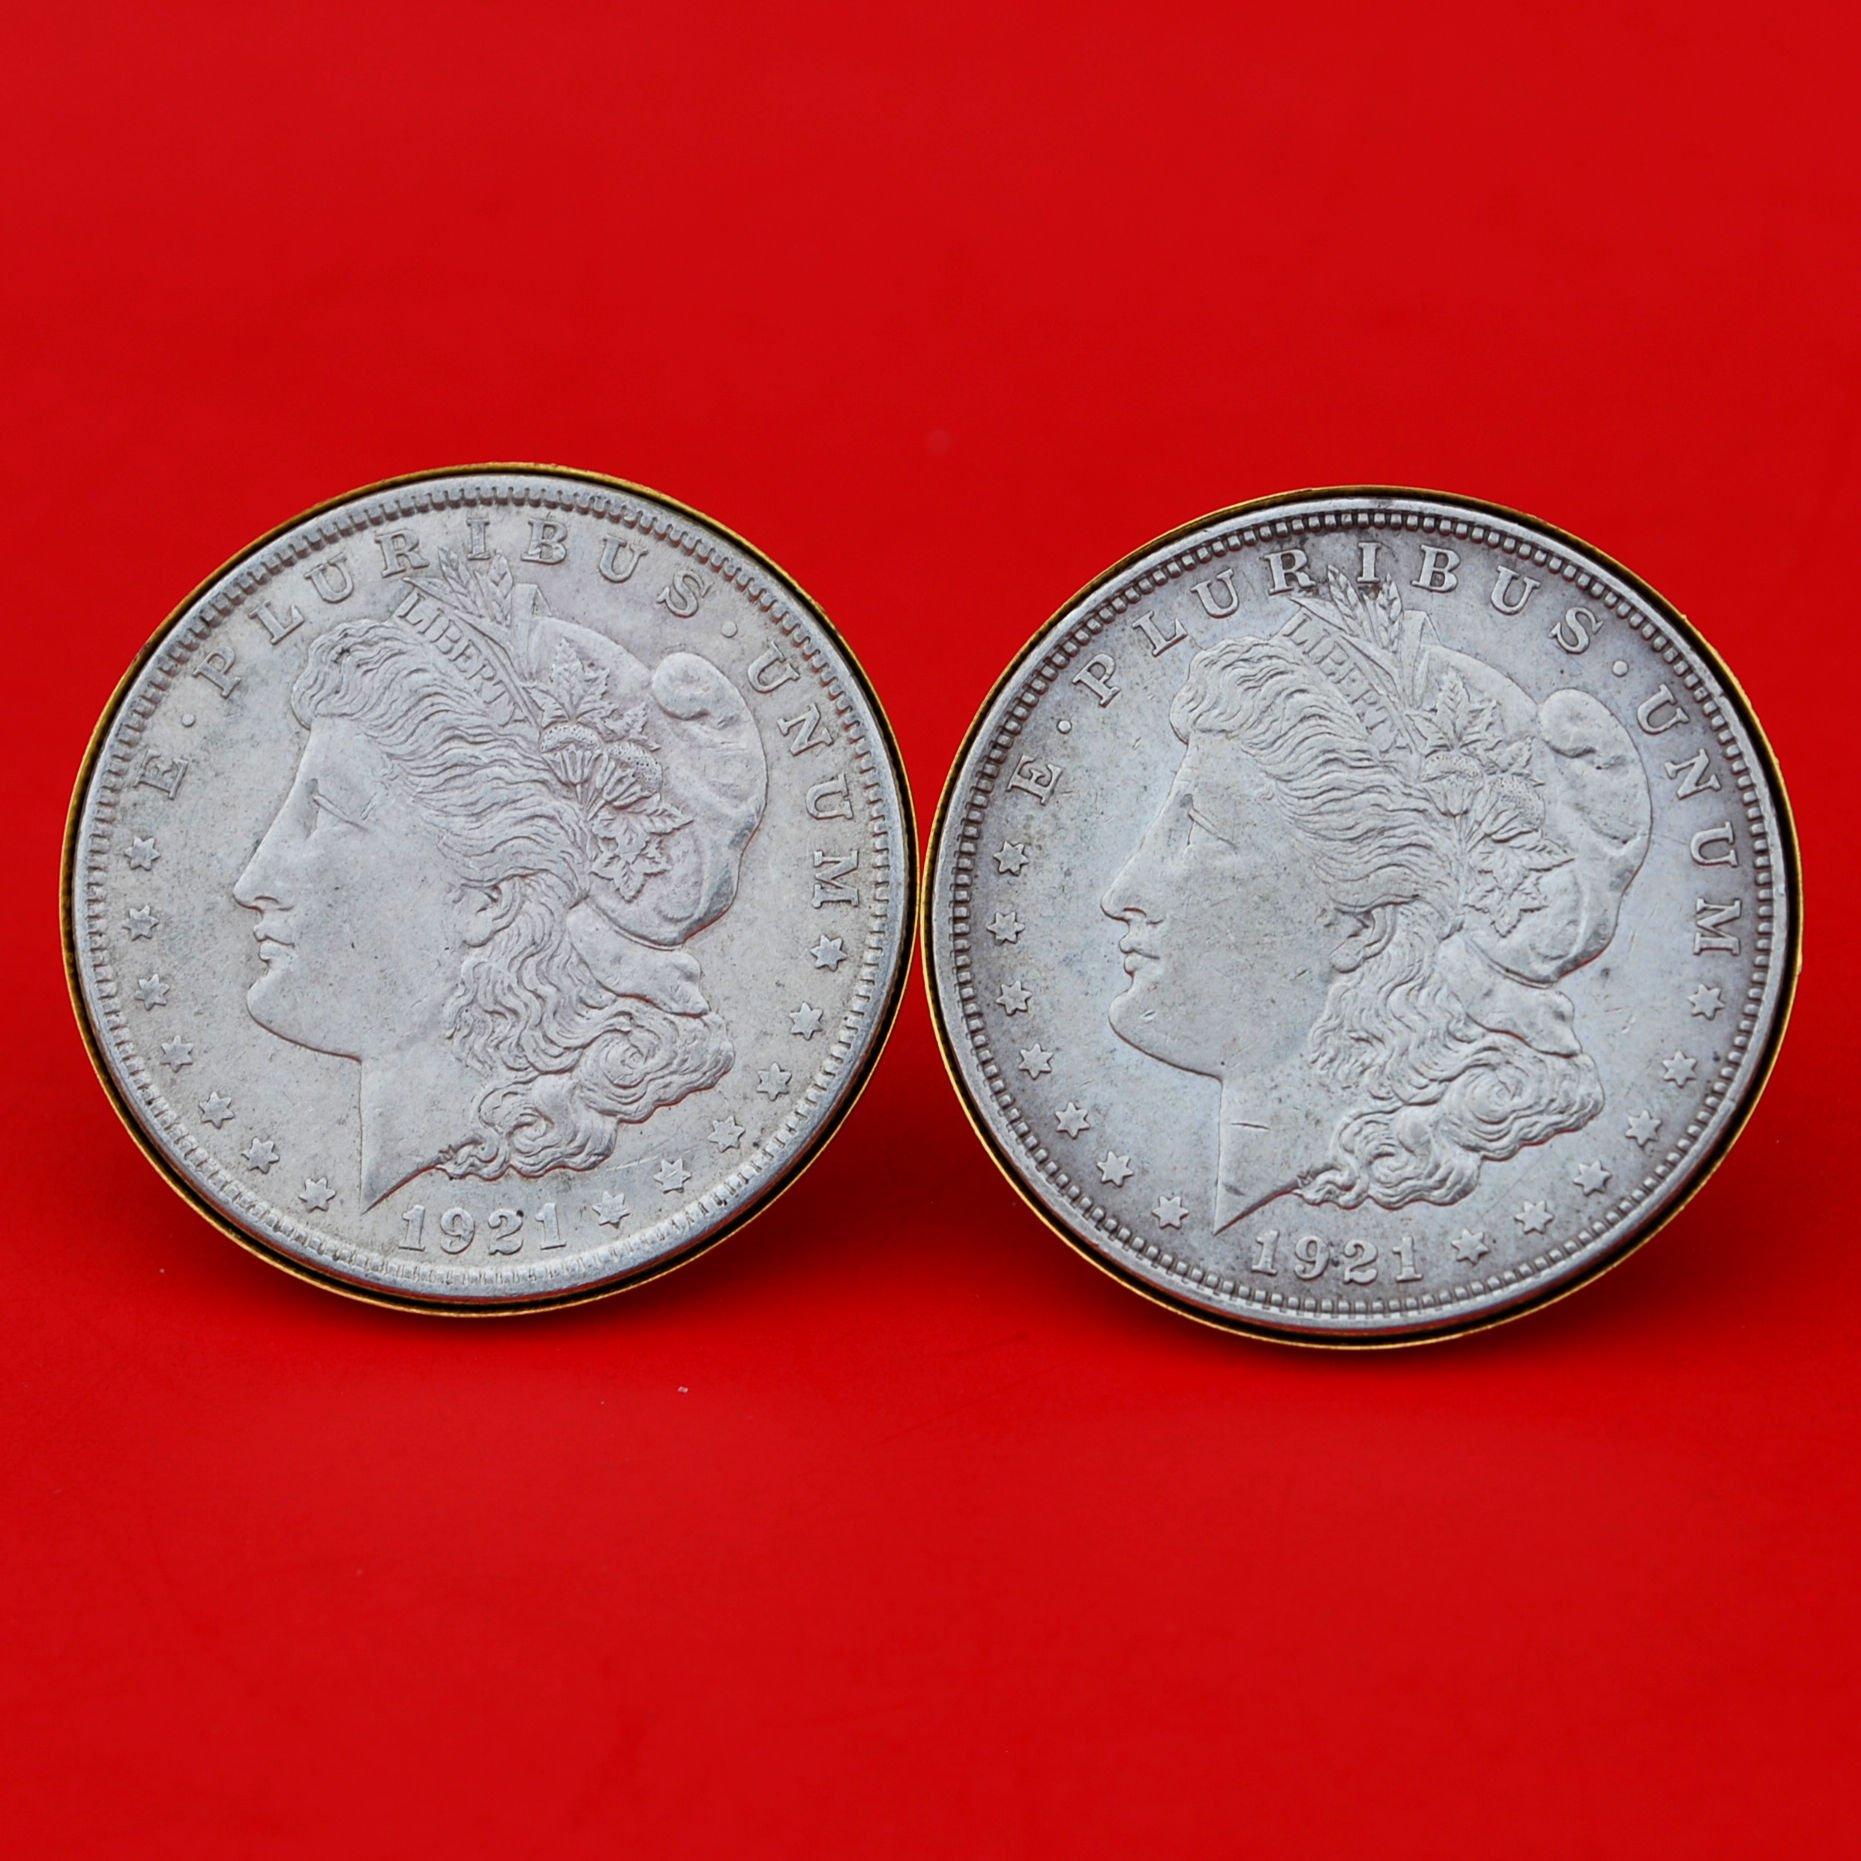 US 1921 Morgan Silver Dollar Gold Cufflinks NEW